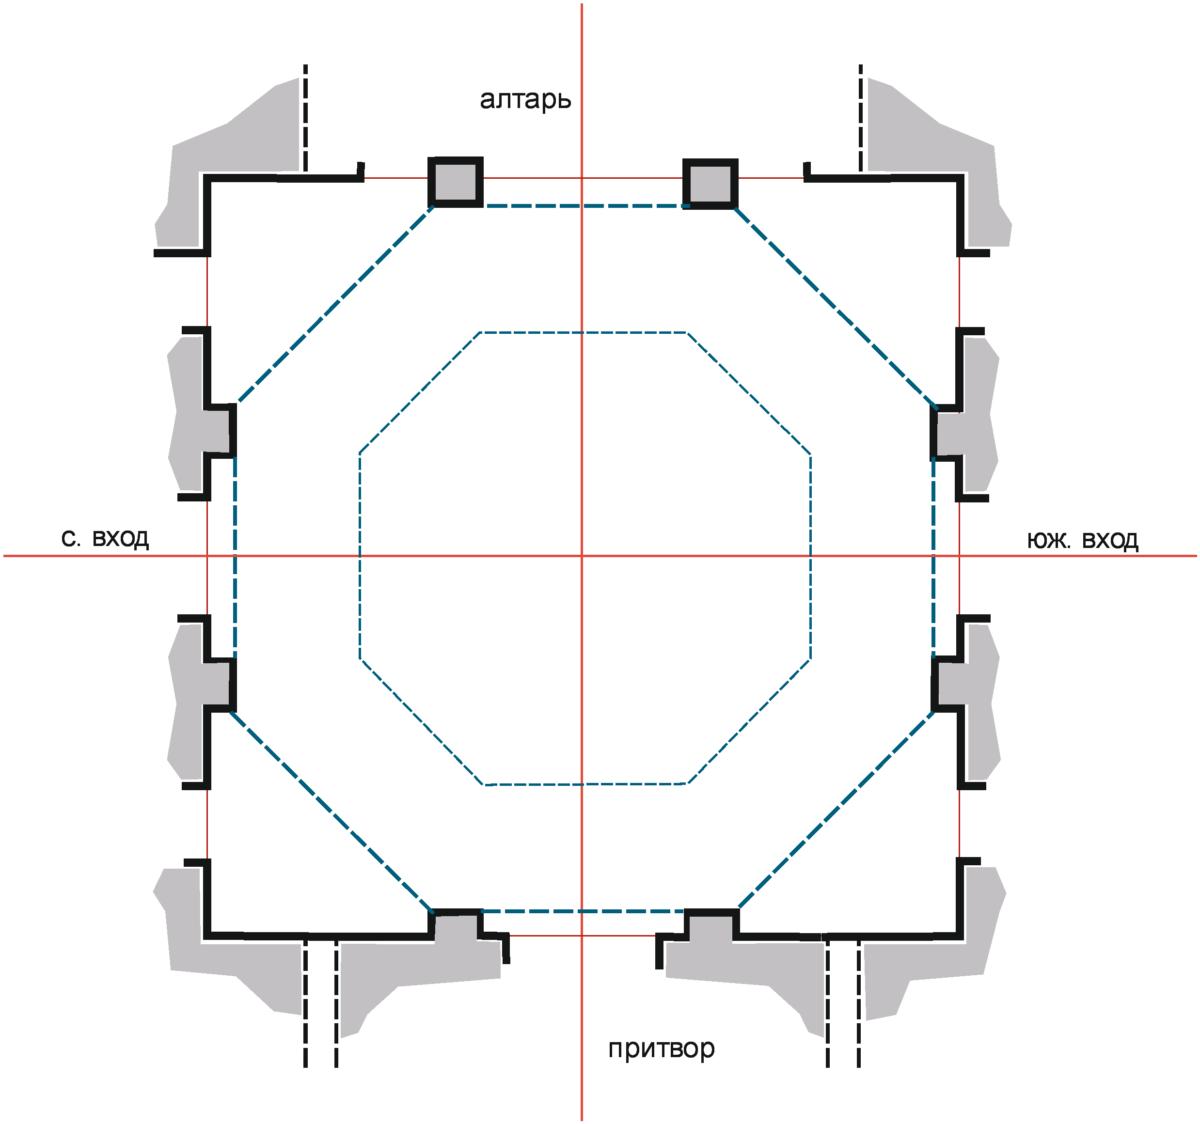 План храма в Киреево. Реконструкция арх. Алексея Карпова.